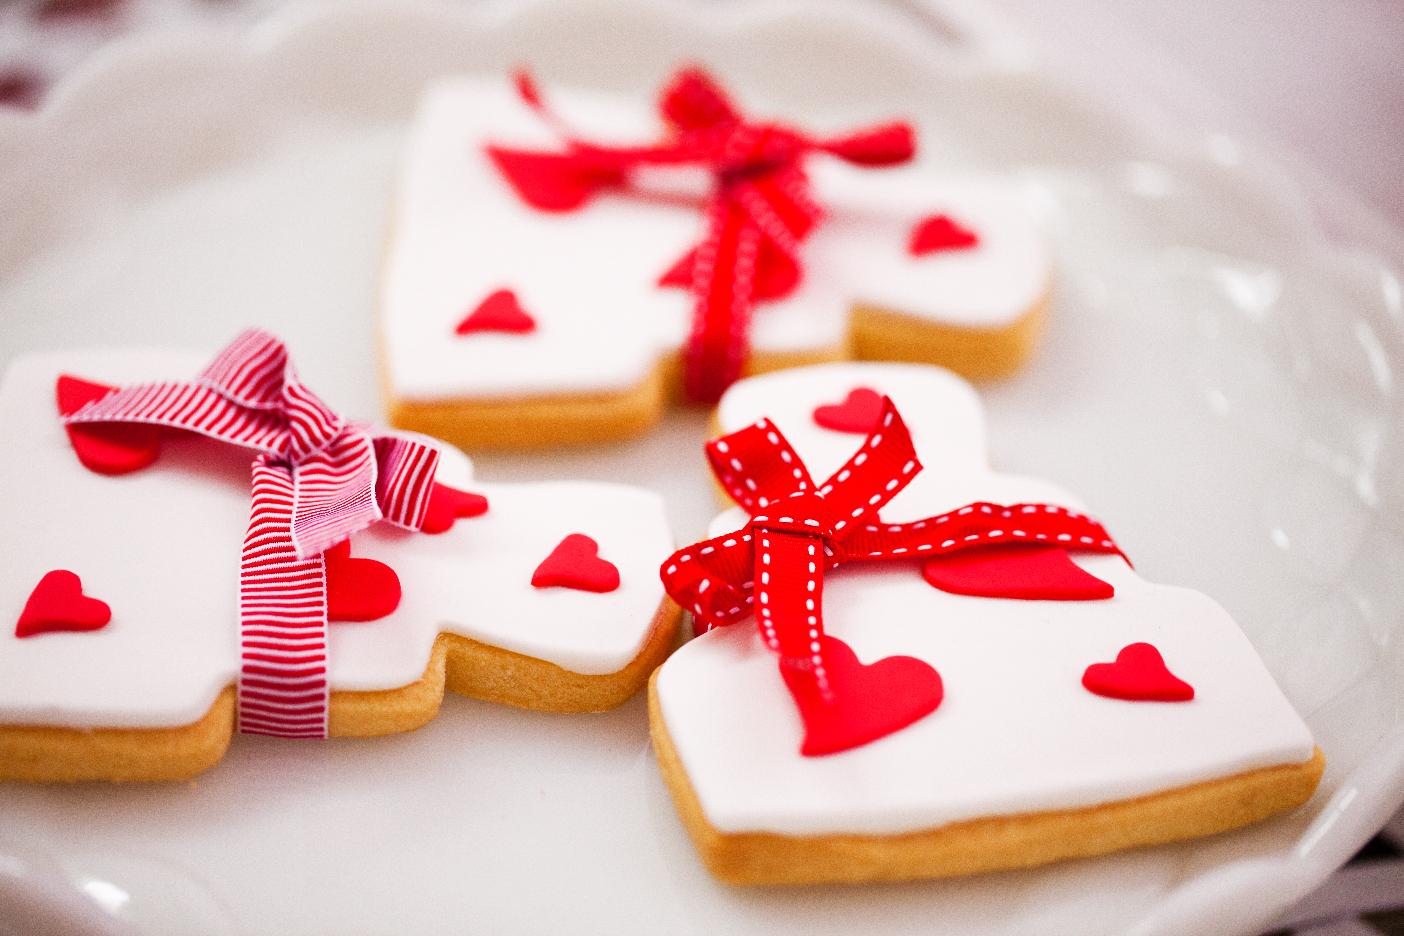 Download 768x1024 wedding cake, dessert, sweets, creamy wallpapers.